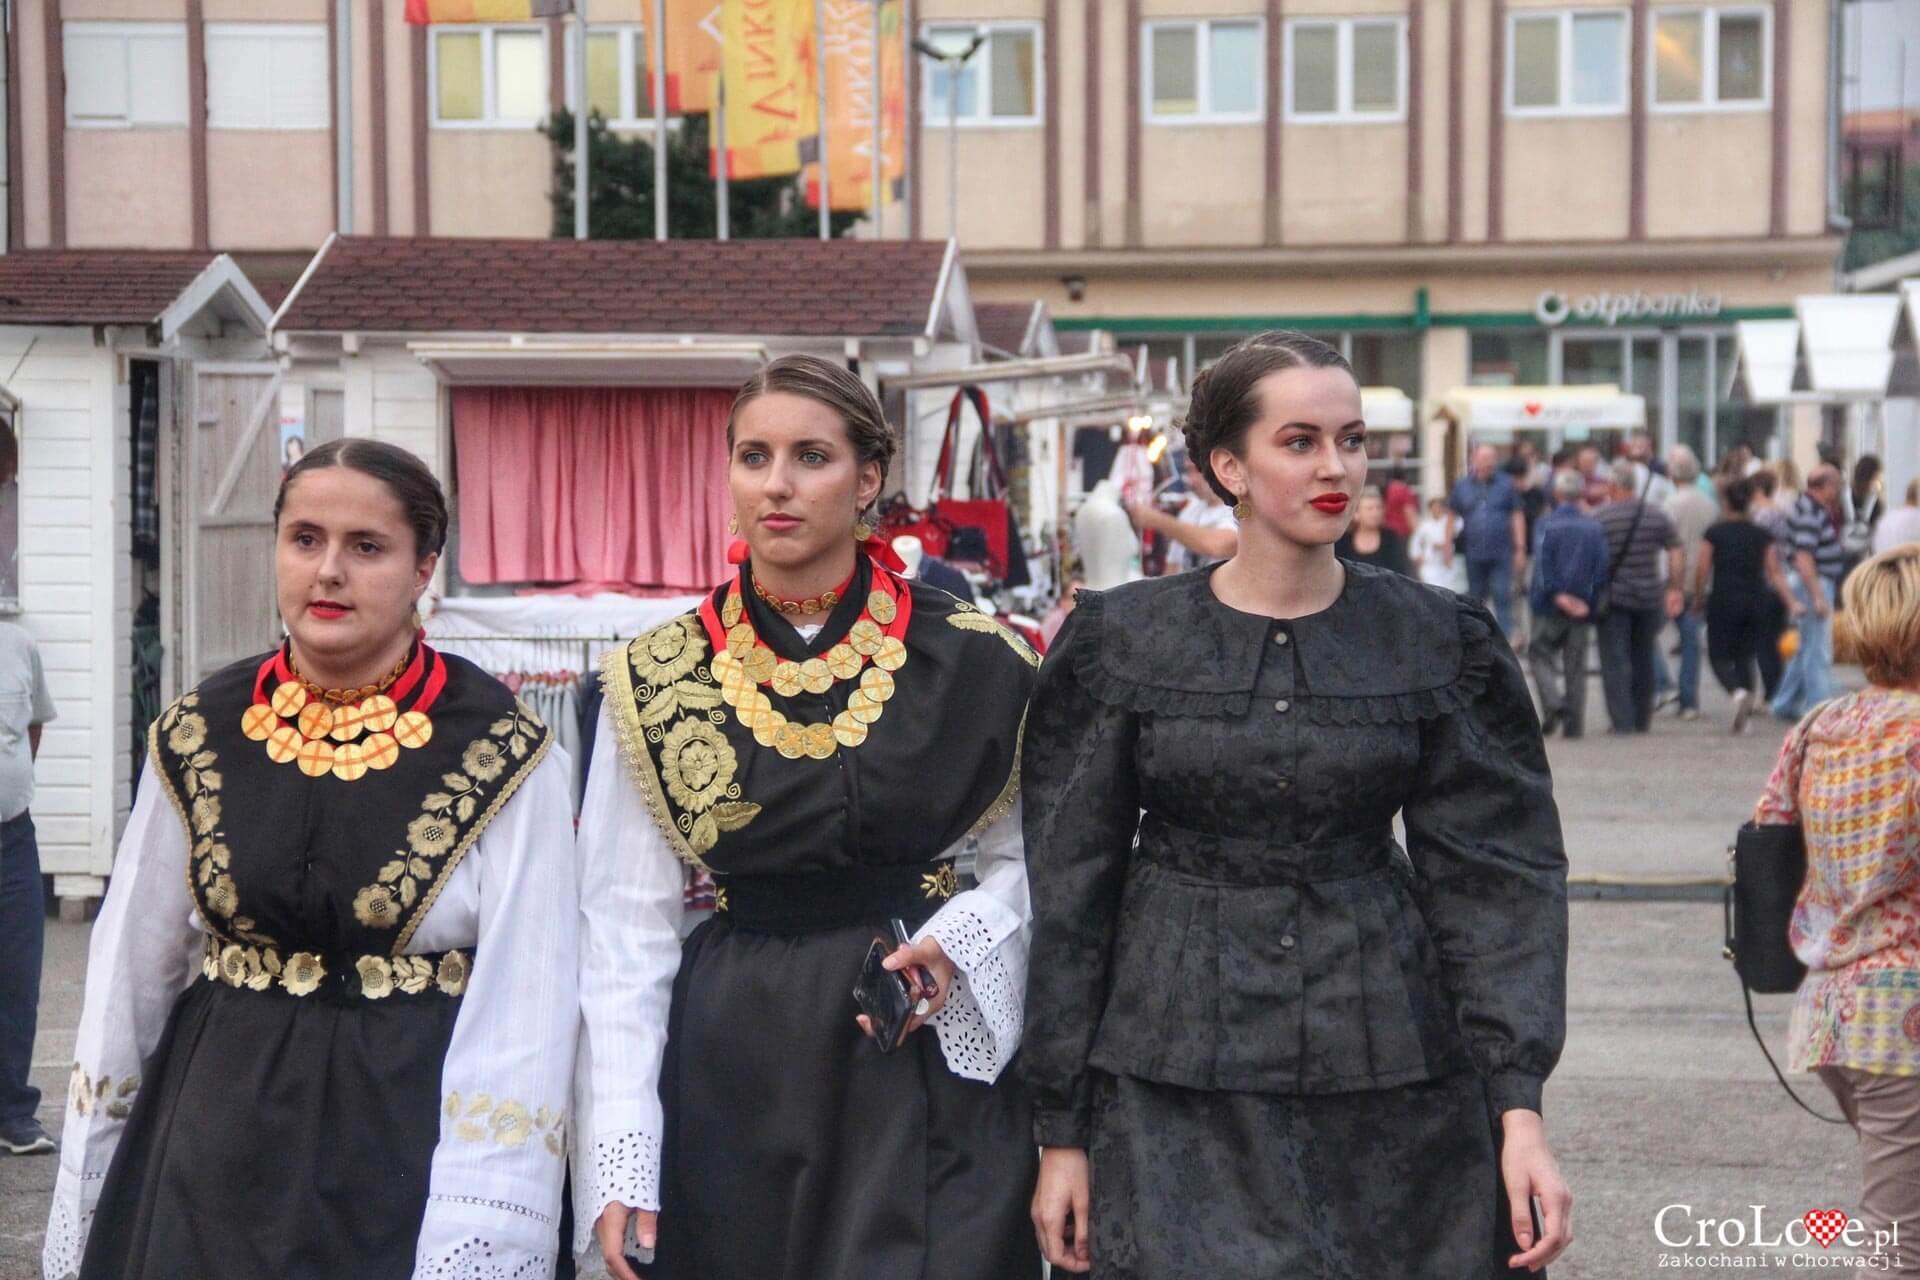 Festiwal Vinkovačke Jeseni w Vinkovci